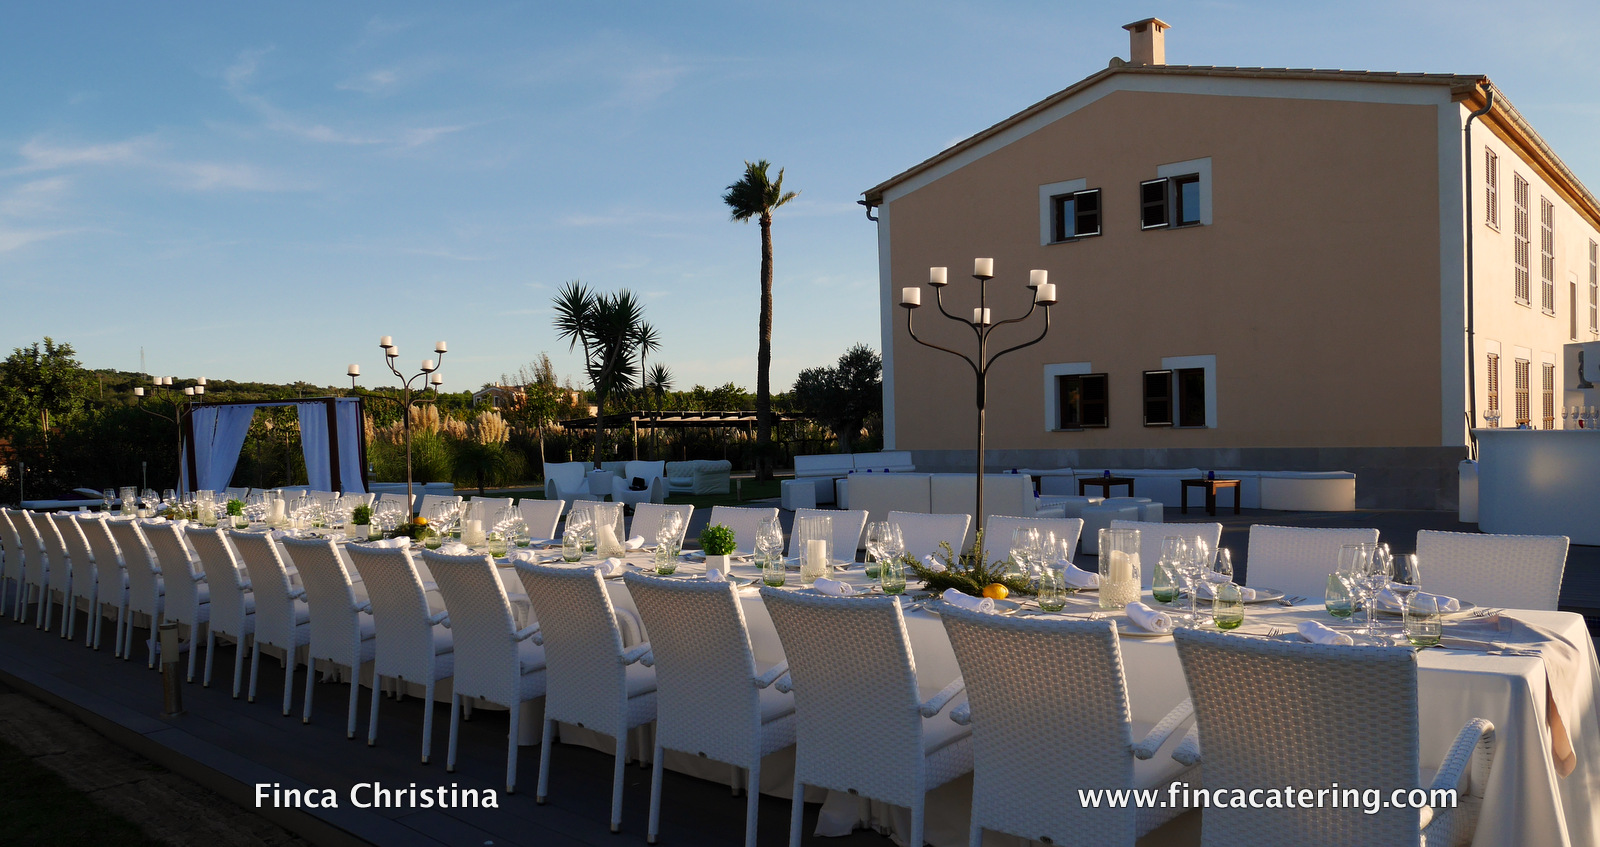 20 Finca Catering 10 17 2014 78 - Property Cristina